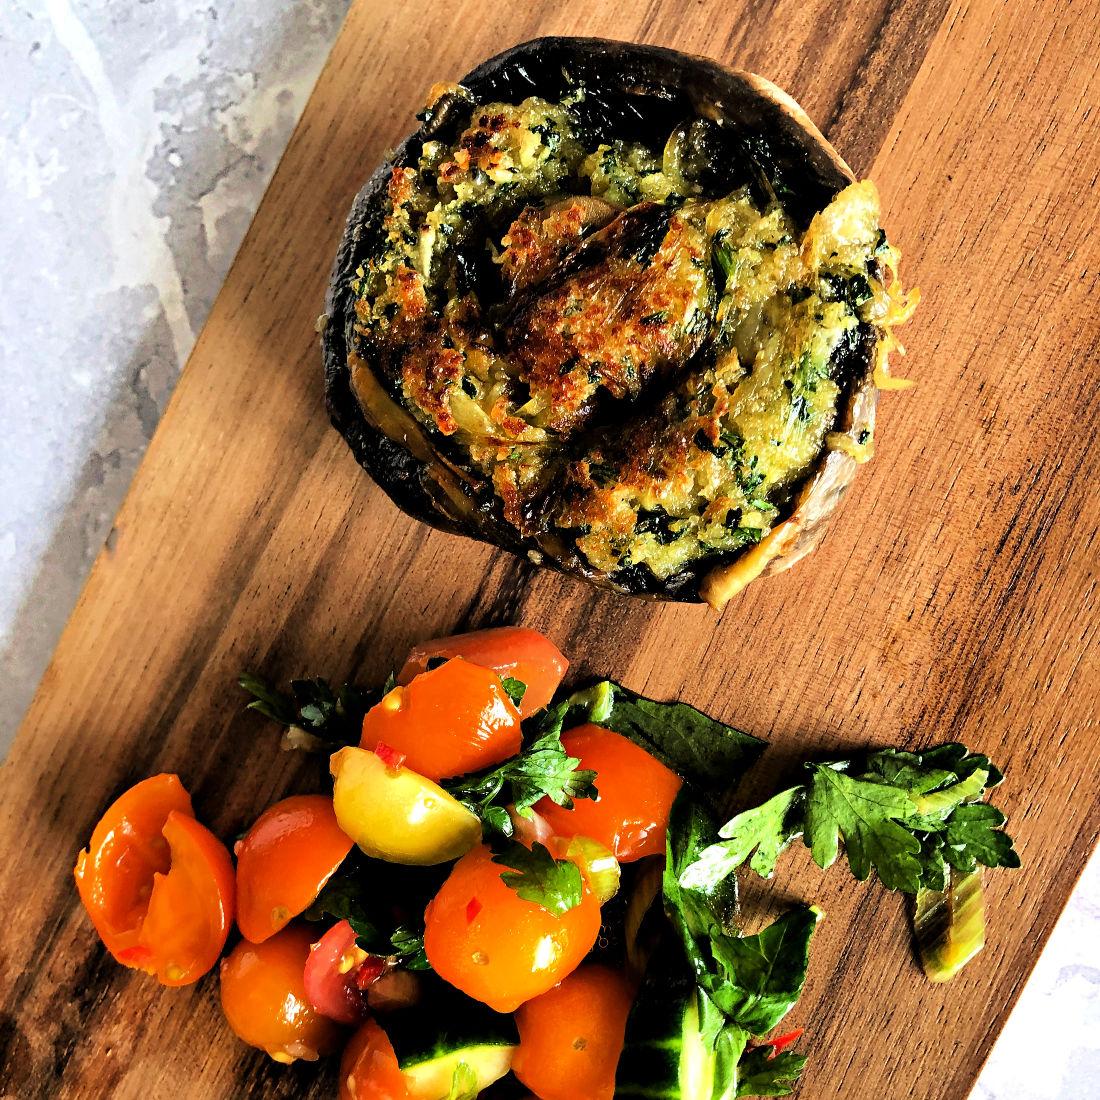 Beauvale-Stuffed-Mushrooms-Recipe-Low-ResW5KI7GAnyLKaN